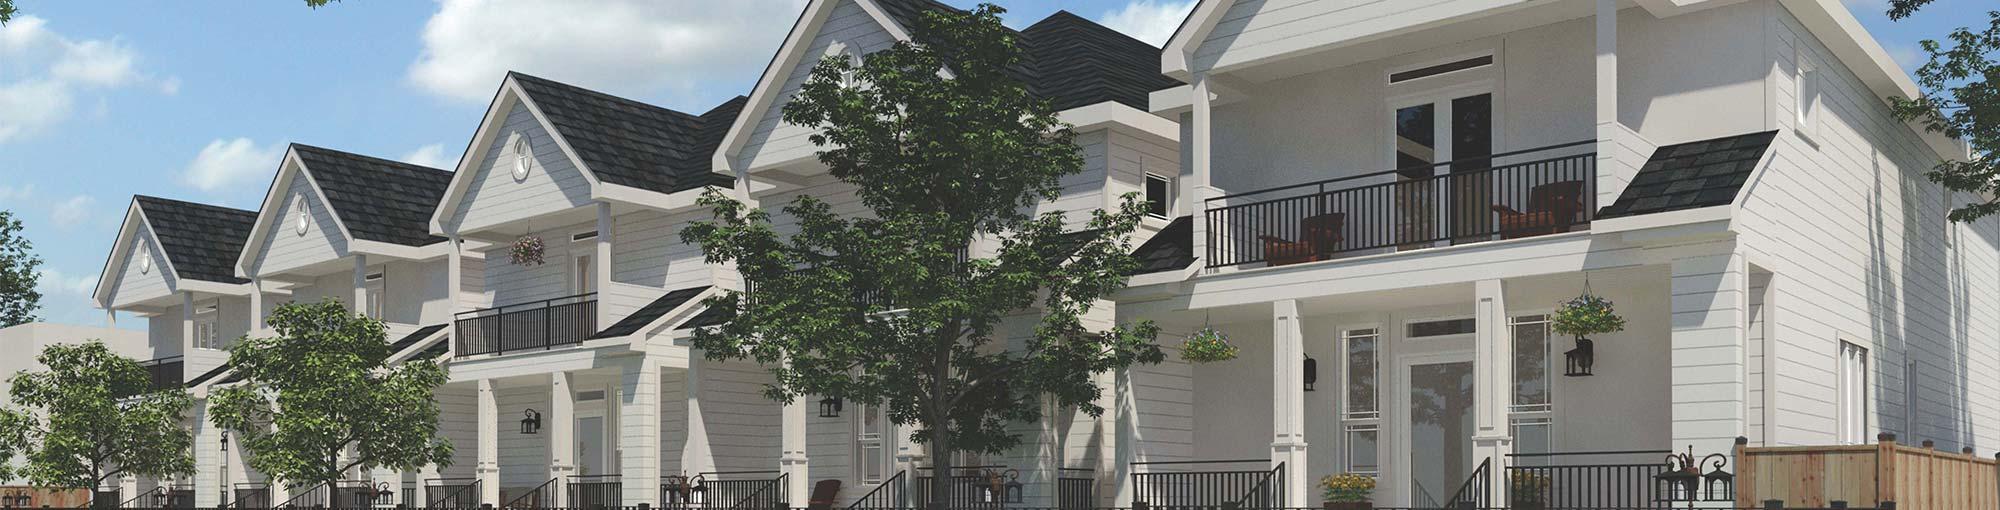 Rendered Model Homes